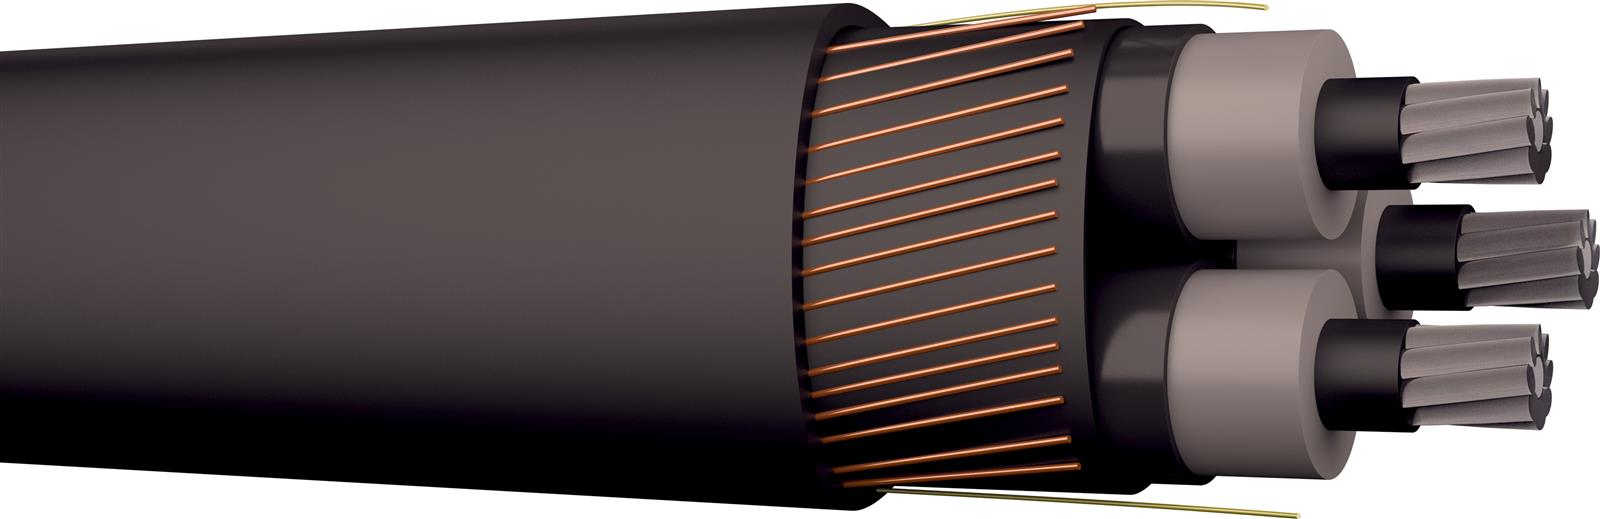 AXLJ-RMF 3X150/25 LT 12KV